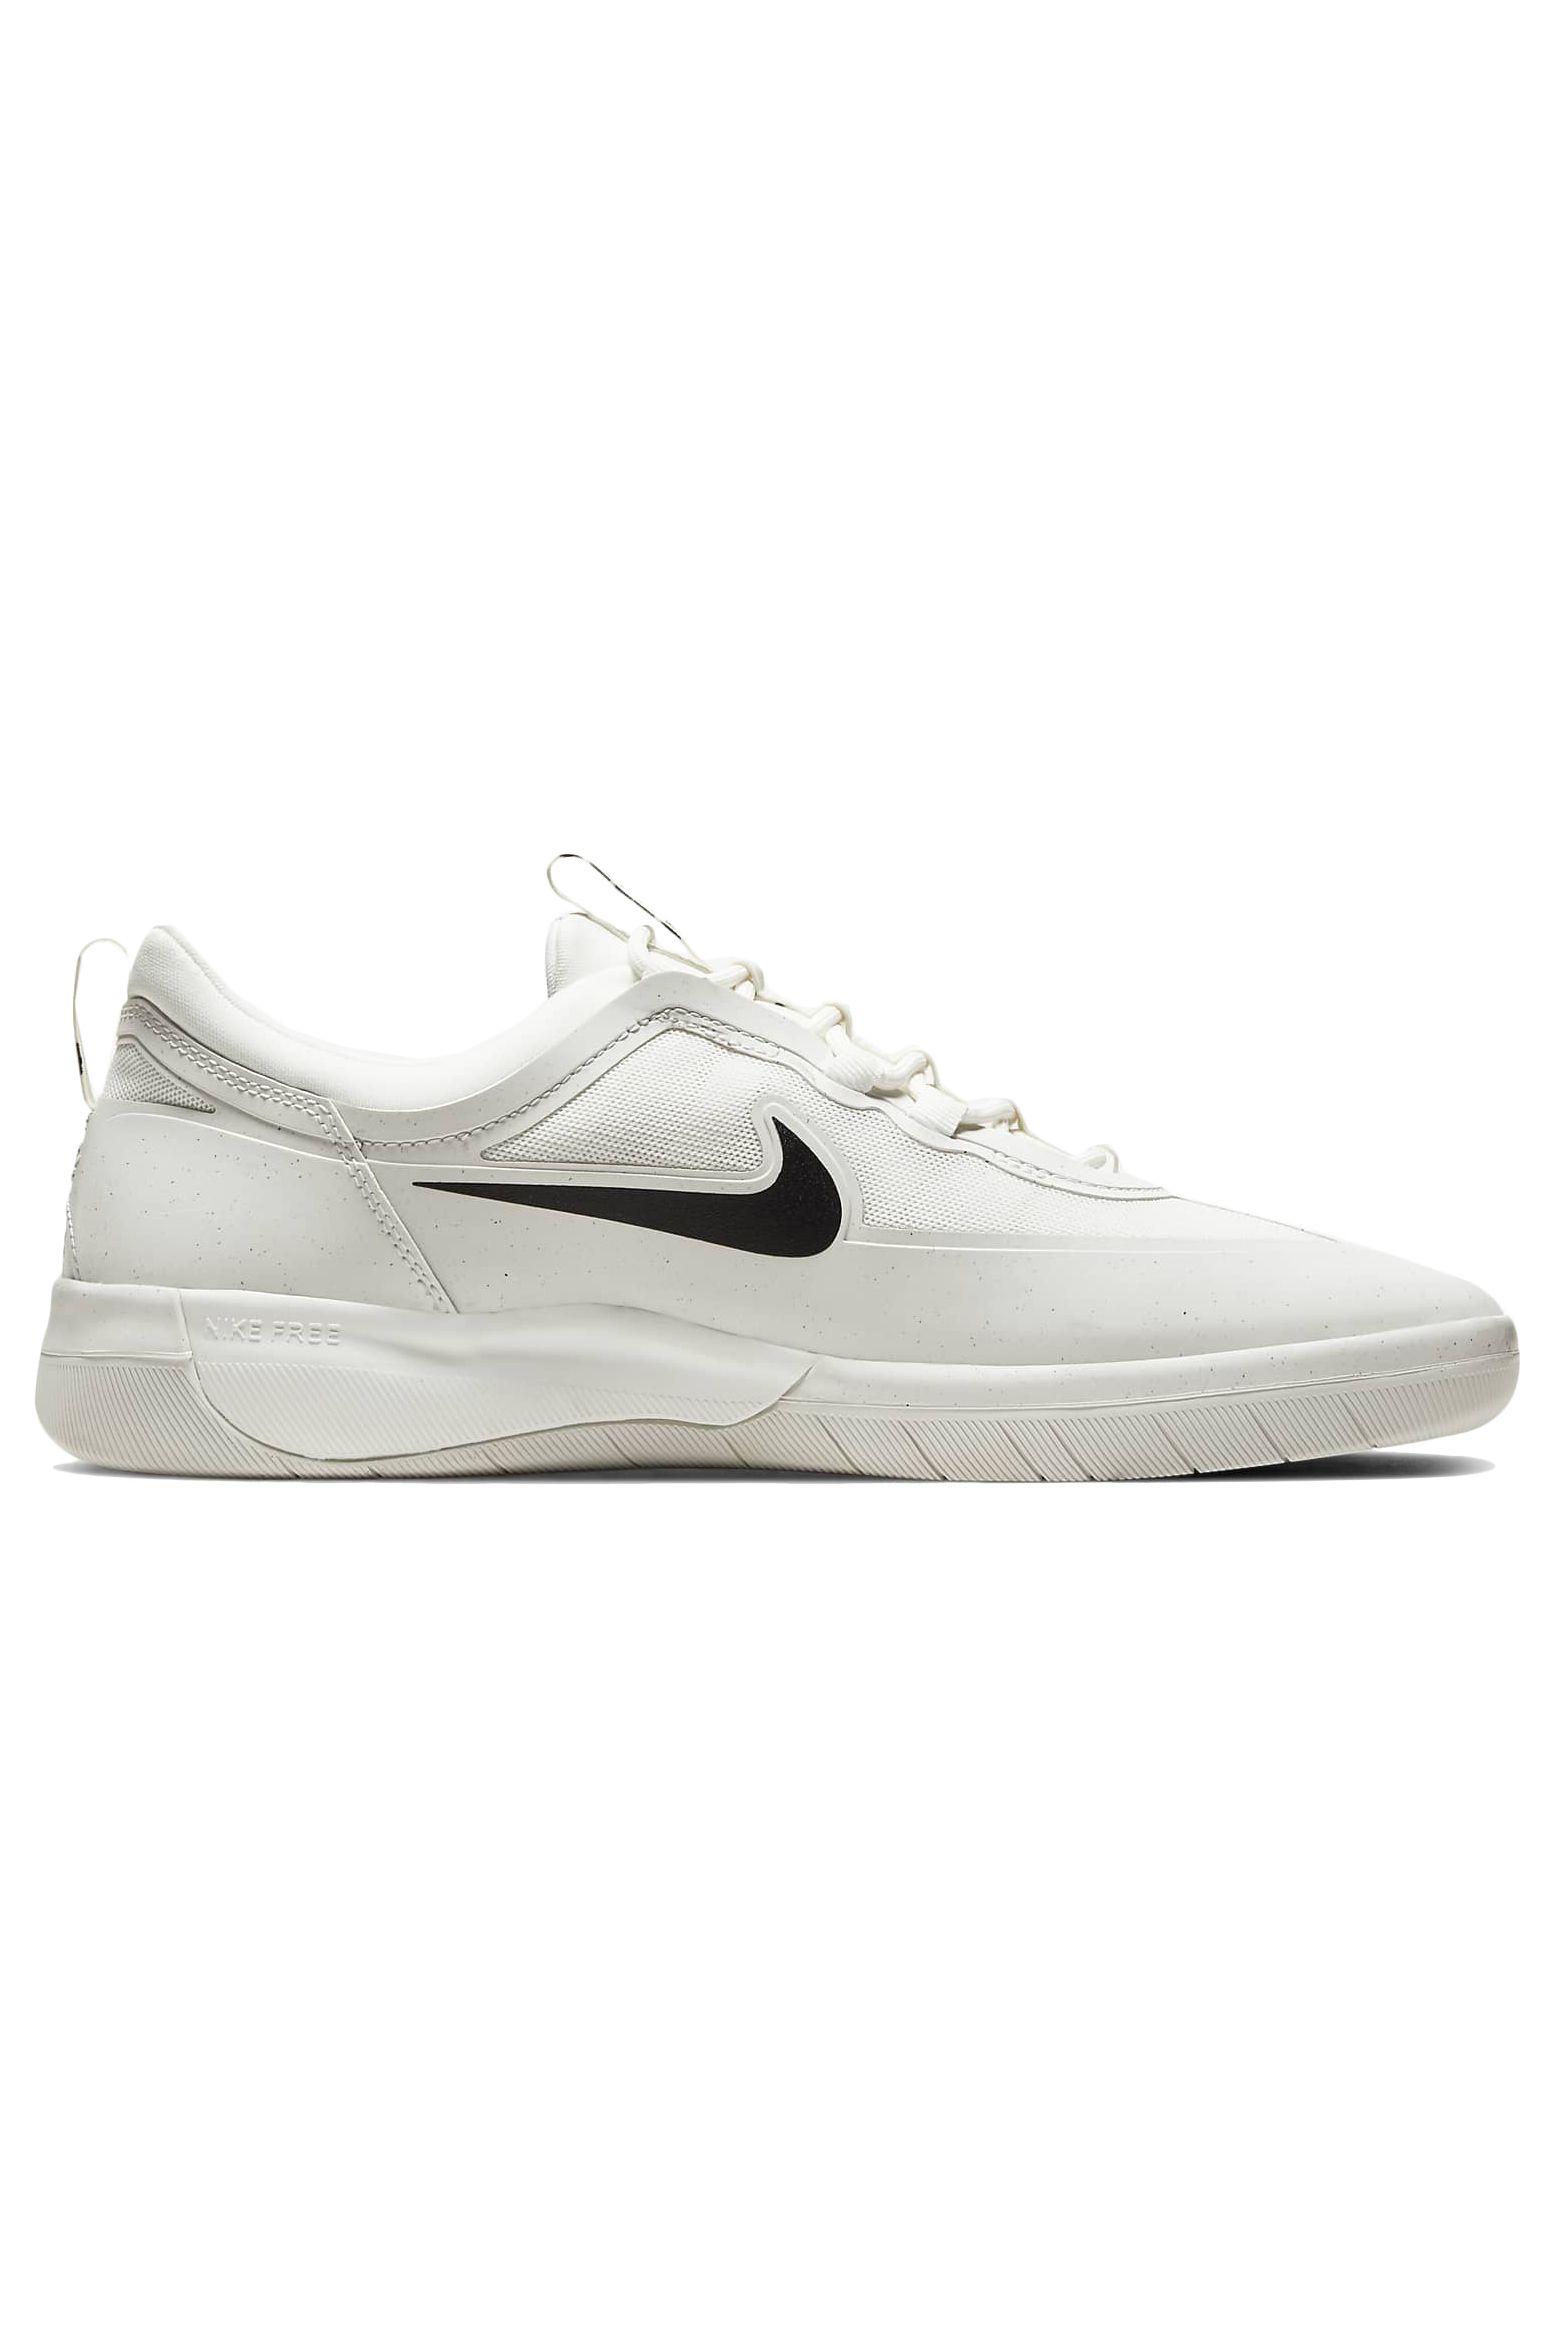 Nike Sb Shoes NIKE SB NYJAH FREE 2.0 Summit White/Black-Summit White-Summit White